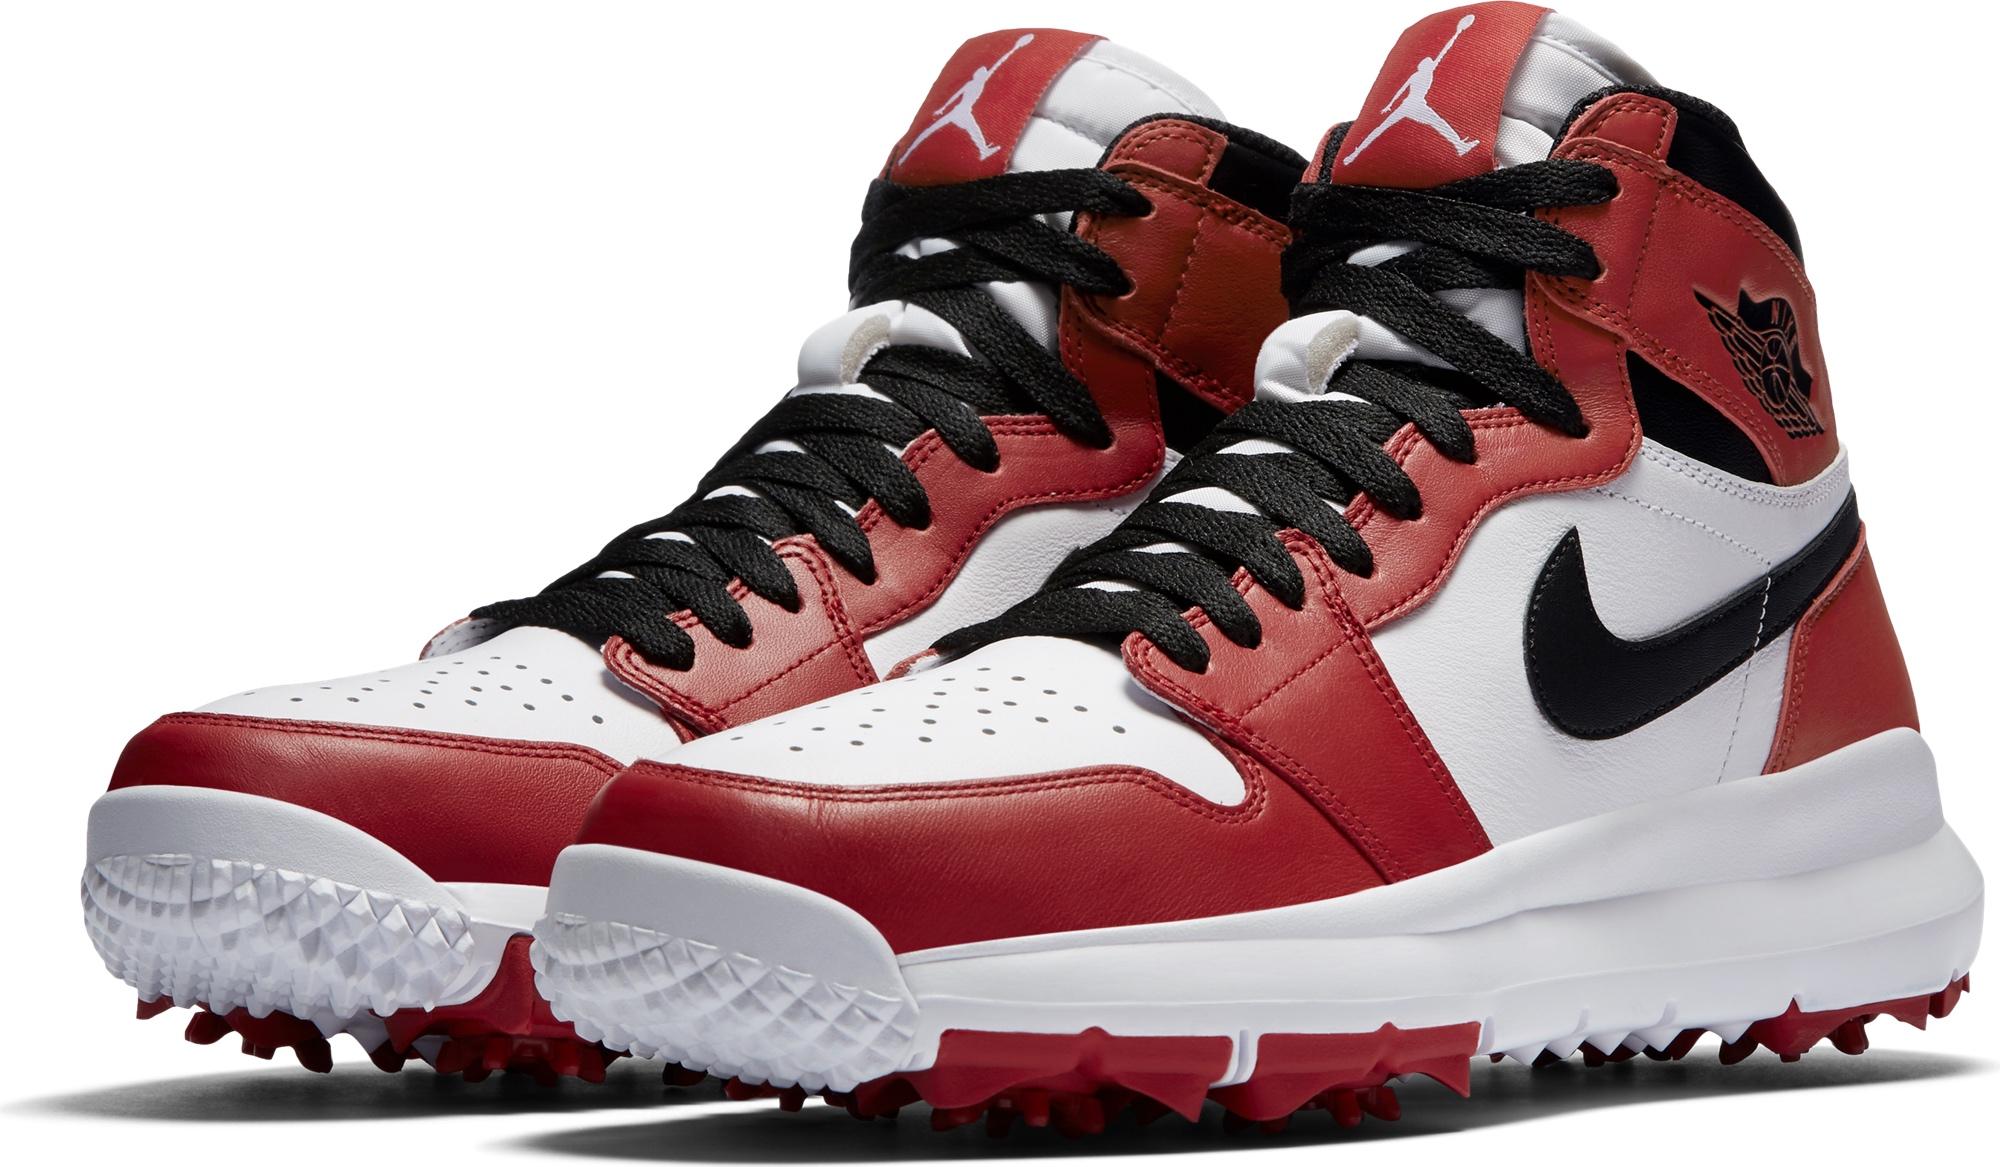 les air jordan golf les nouvelles chaussures montantes de nike bogeymag blog golf. Black Bedroom Furniture Sets. Home Design Ideas